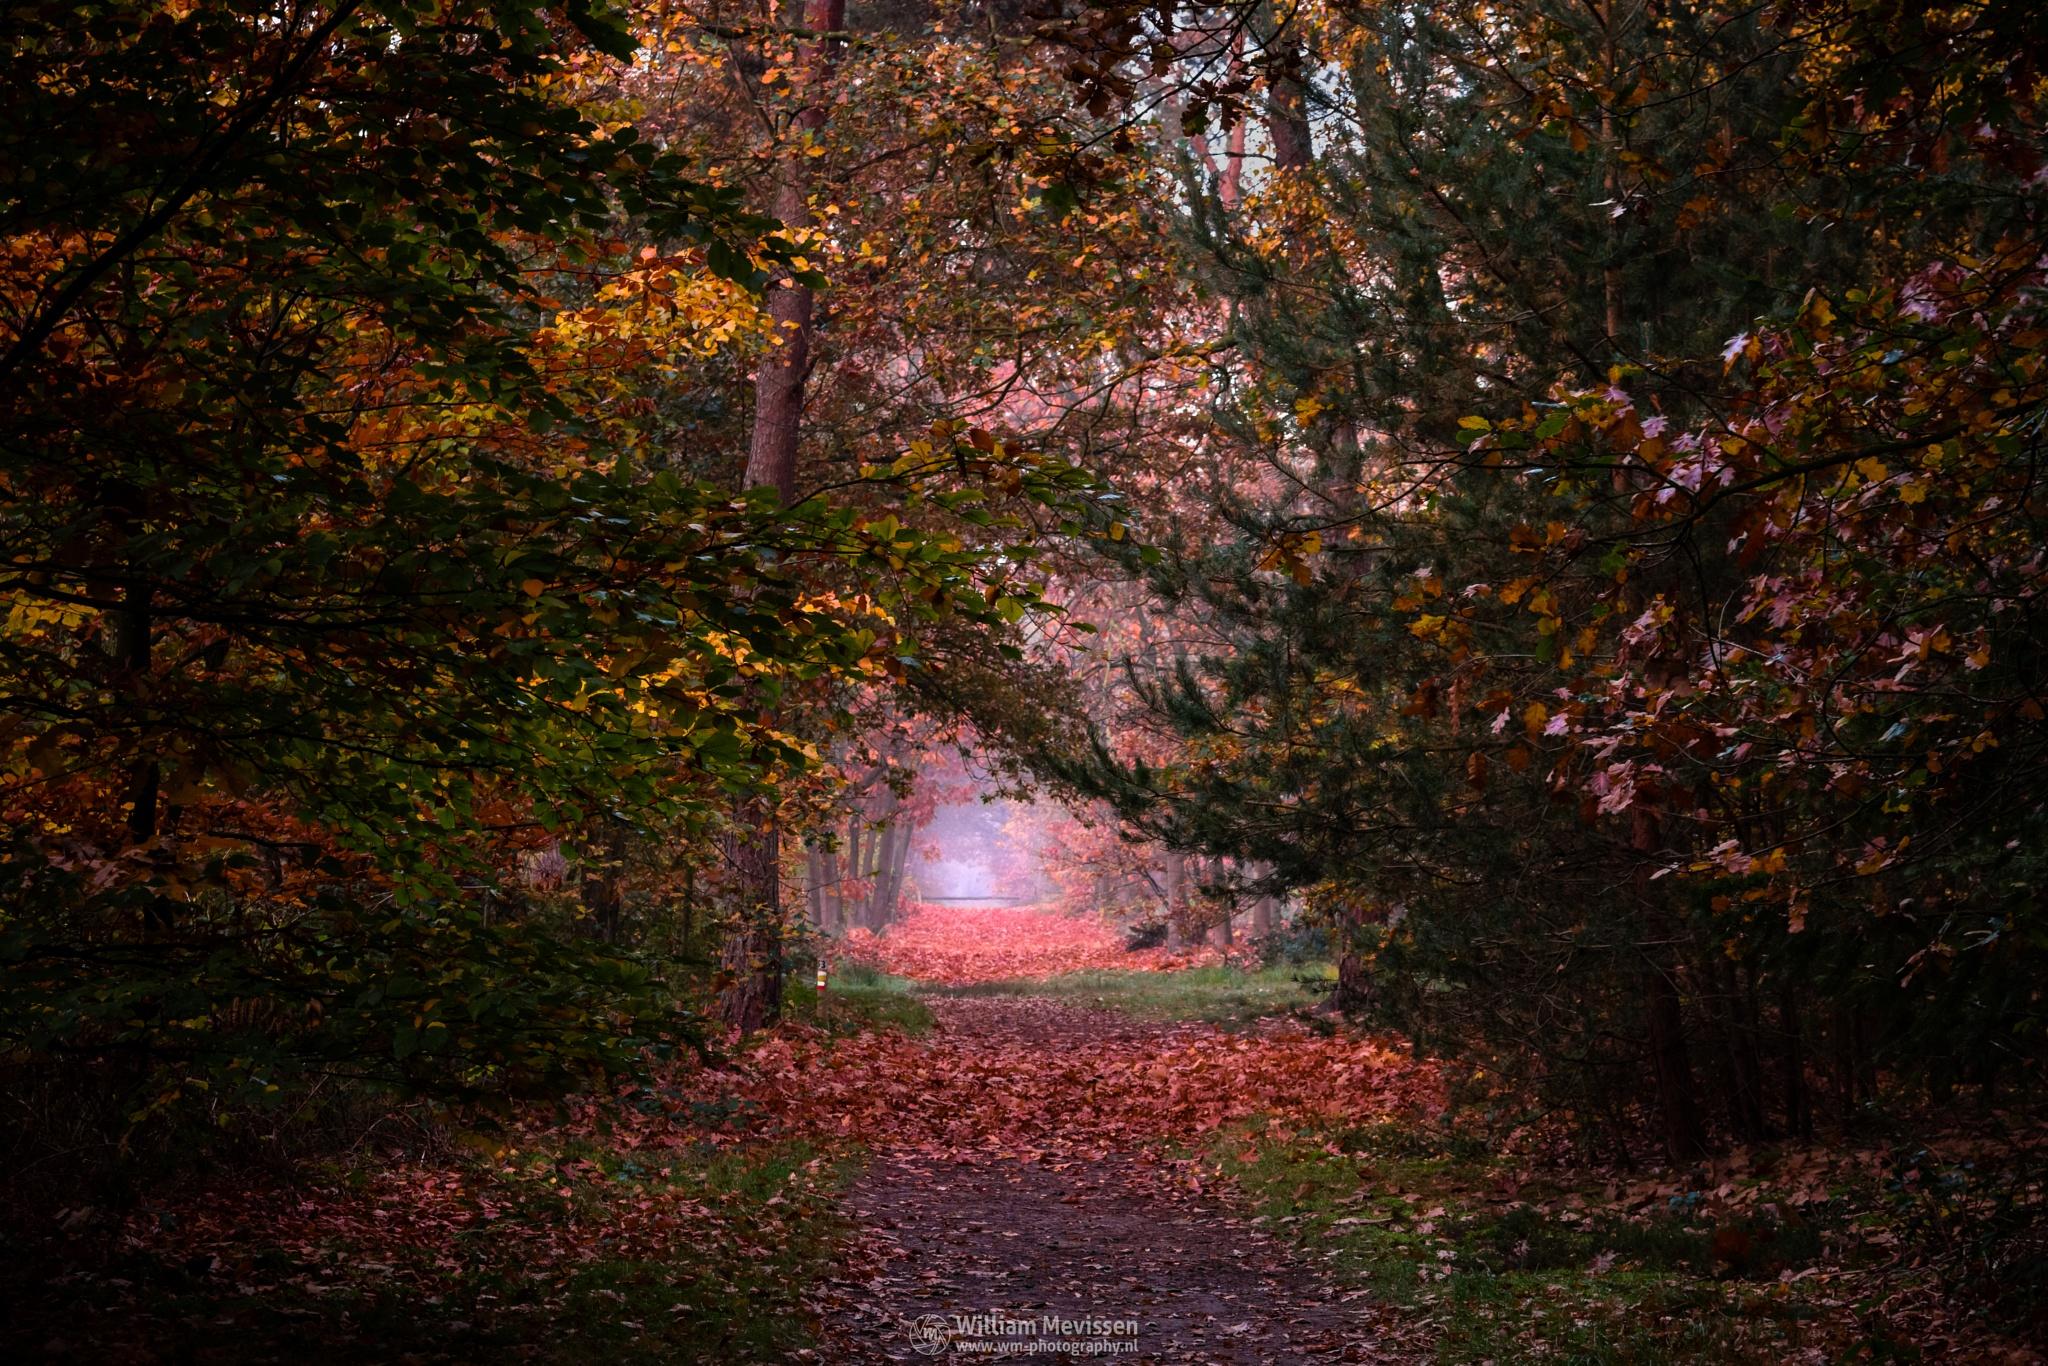 Photo in Nature #geijsteren #venray #oostrum #landgoed geijsteren #landgoed #estate #weichs de wenne #limburg #noord-limburg #nature #nature reserve #forest #woods #autumn #leaves #red #green #orange #yellow #geysteren #foliage #light #tree #trees #autumn palette #palette #mist #misty #fog #foggy